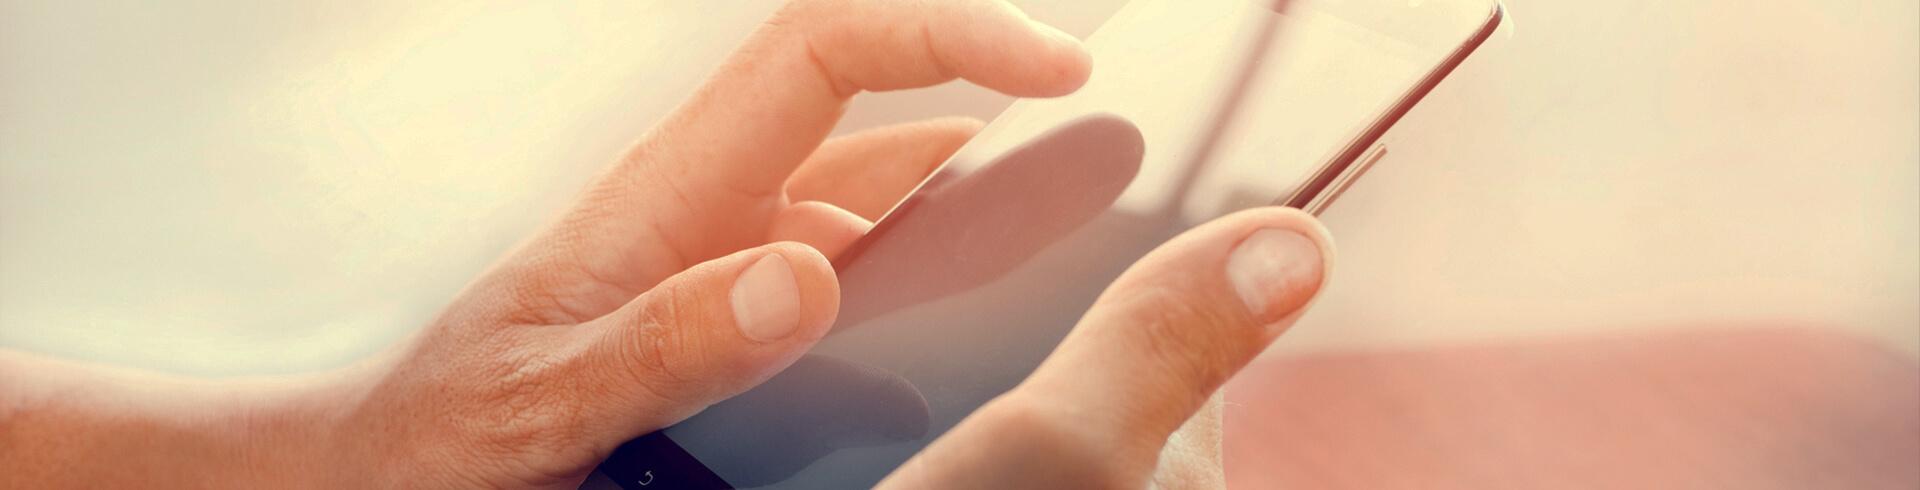 Svenskarna e-handlar mest på Cyber Monday